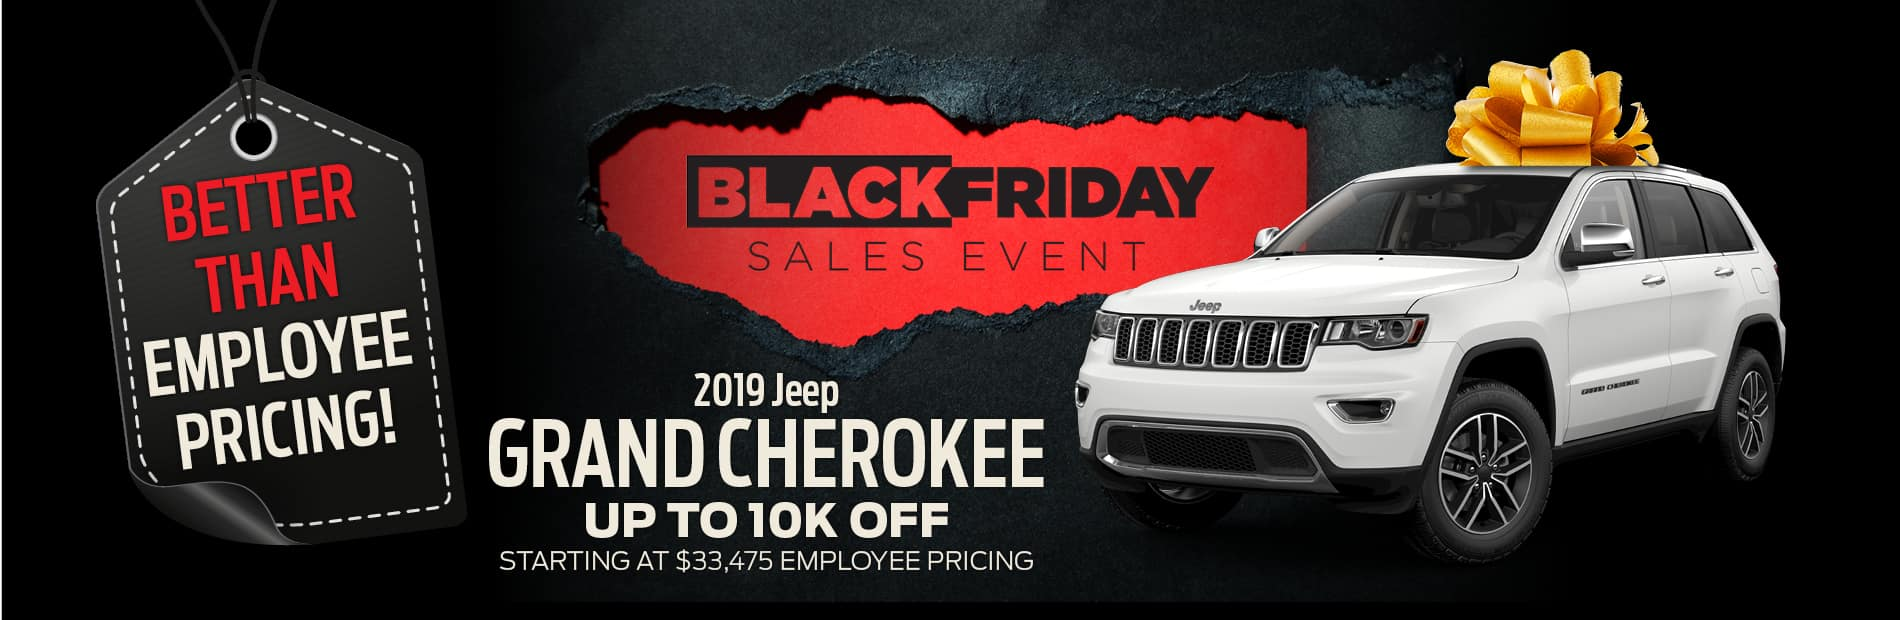 2019 Jeep Grand Cherokee For Sale in Atlanta, Georgia